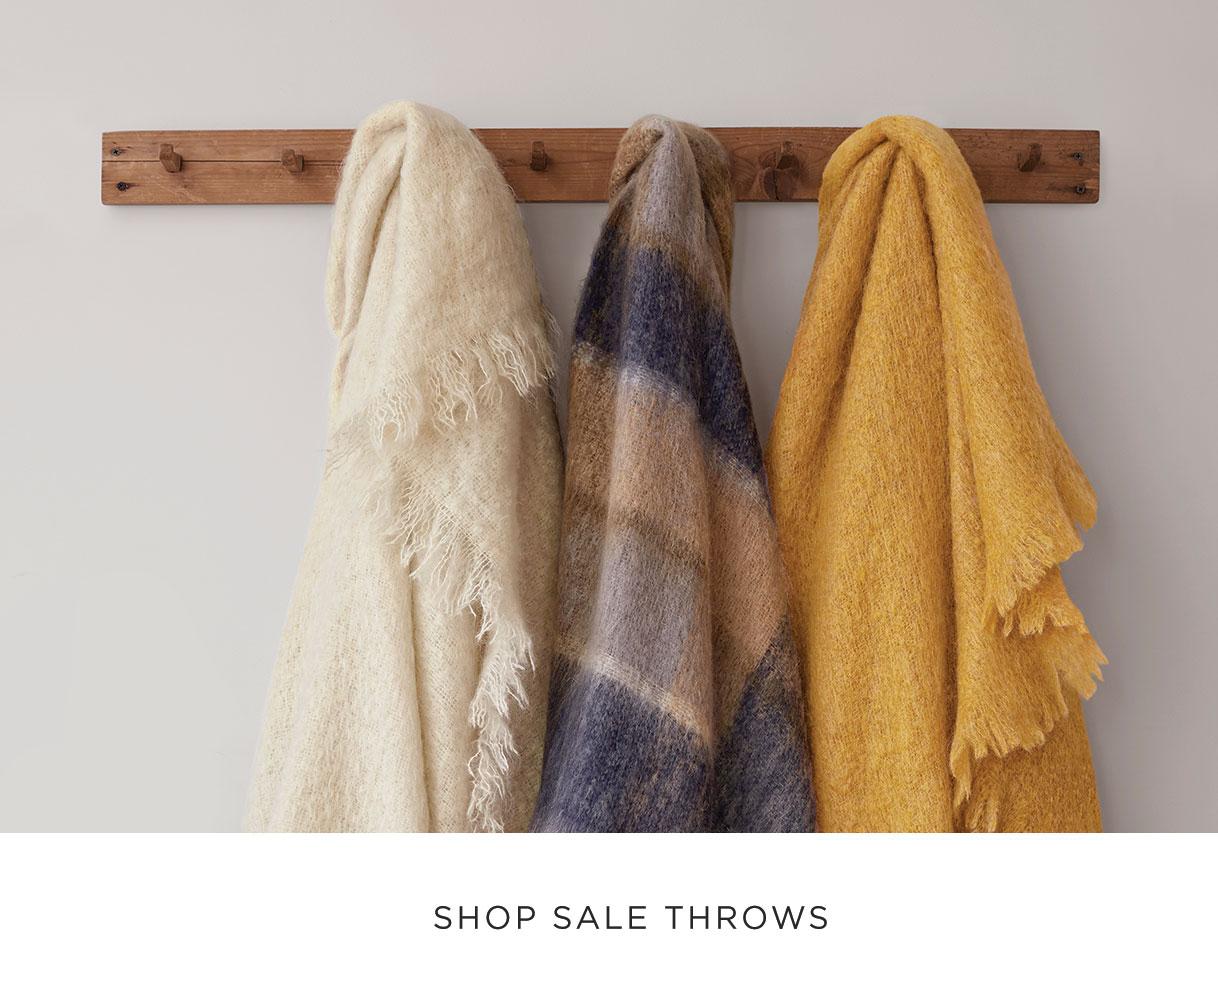 Shop Sale Throws